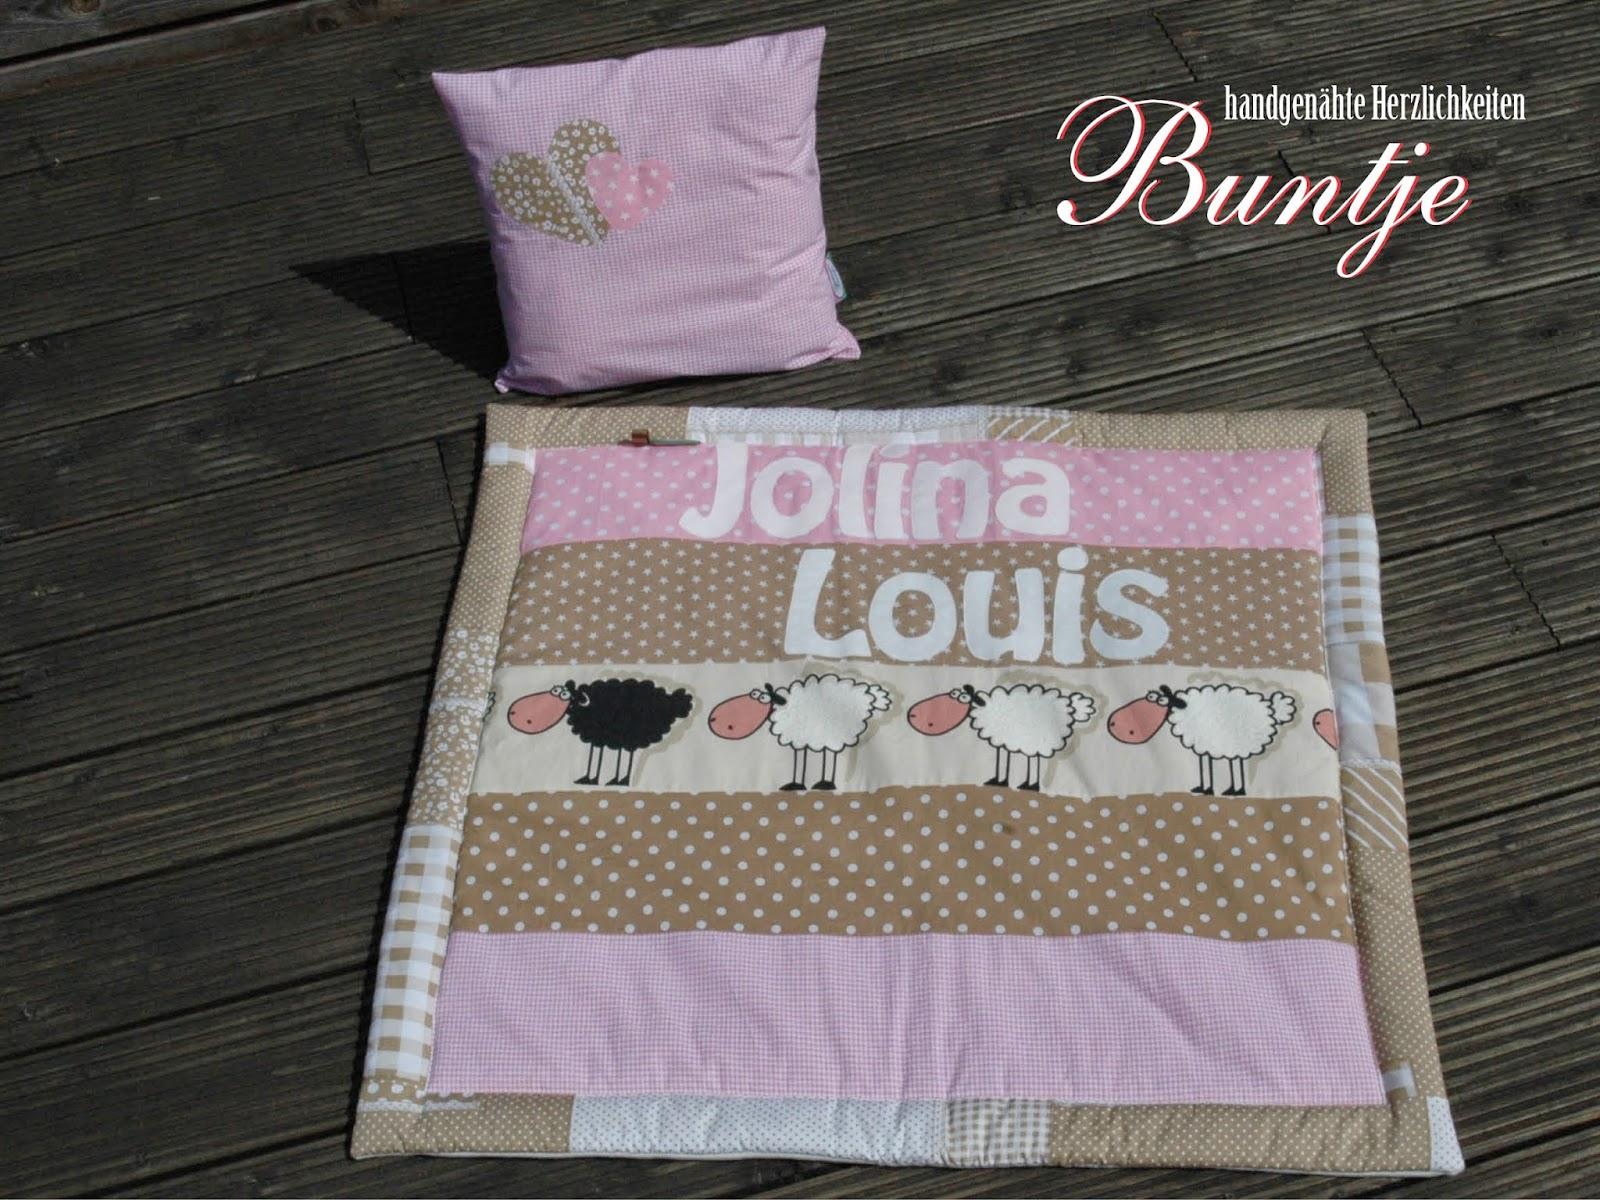 Krabbeldecke Kuscheldecke Decke Baby Name Mädchen Jolina Louis rosa beige Schafe Geschenk Geburt Taufe Baumwolle Fleece Buntje nähen